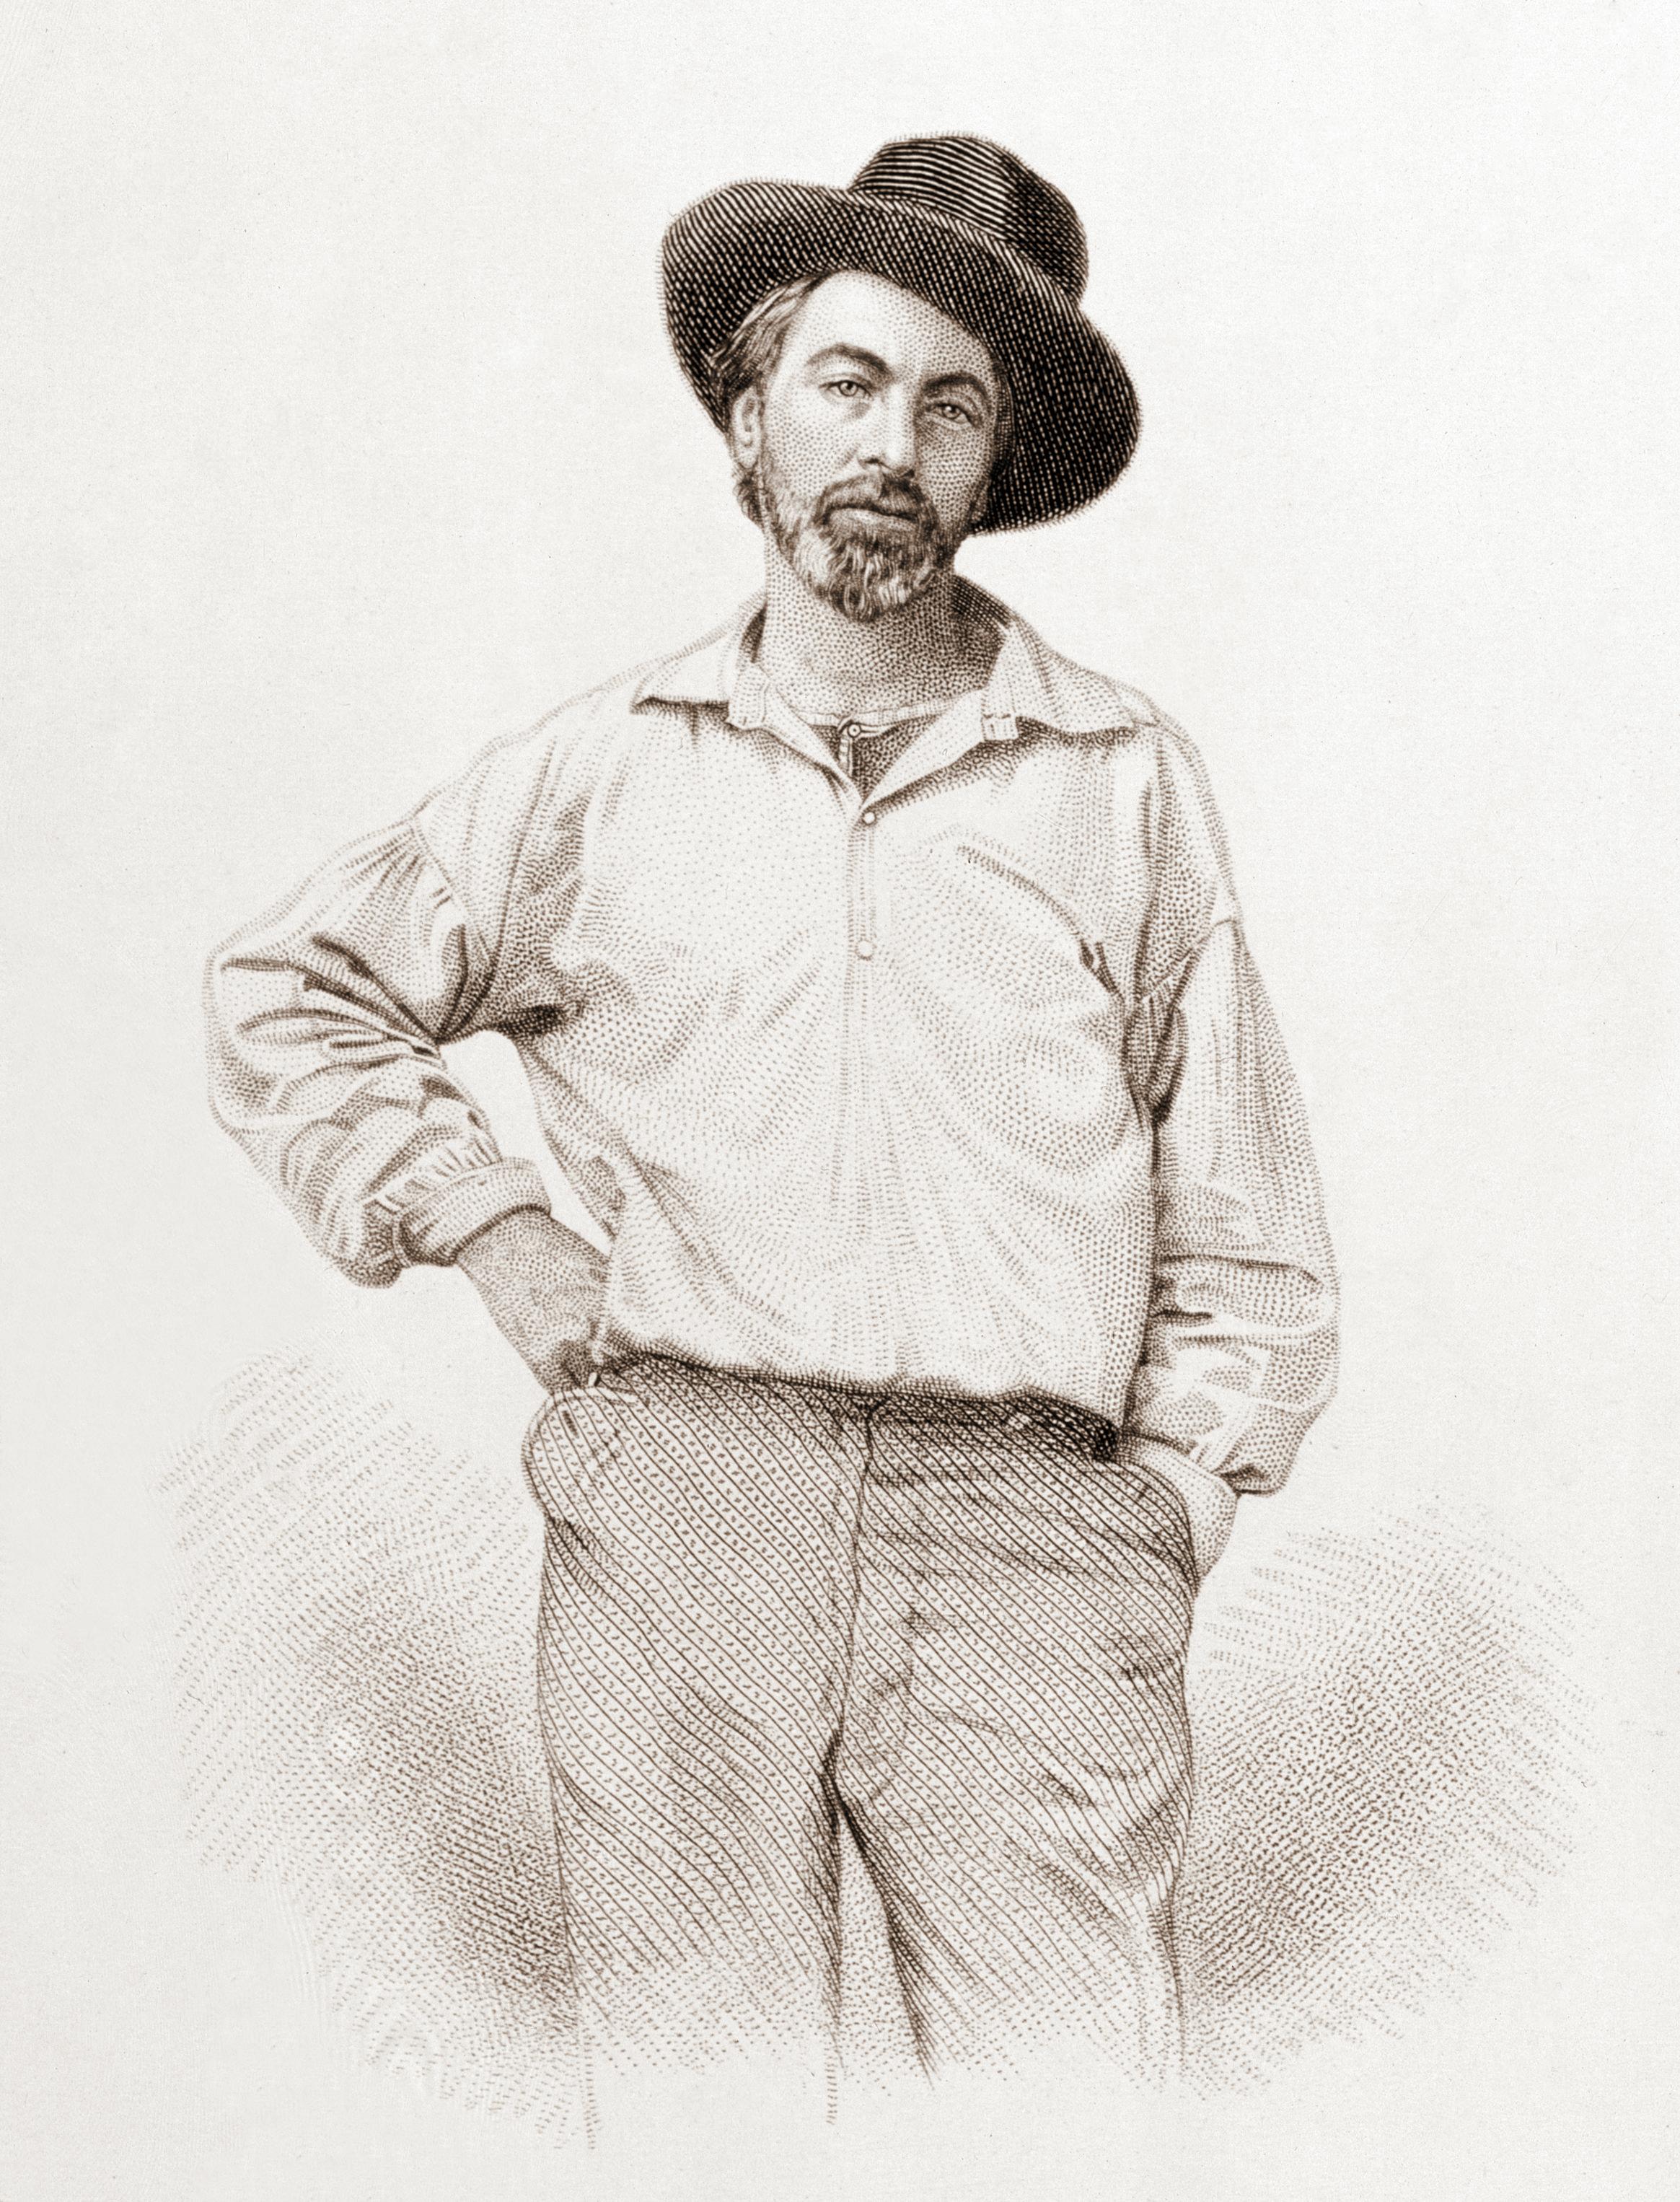 Walt Whitman (1819-1892), age 37, frontispiece to Leaves of grass, Fulton St., Brooklyn, N.Y., 1855, steel engraving by Samuel Hollyer from a lost daguerreotype by Gabriel Harrison, July 1854.